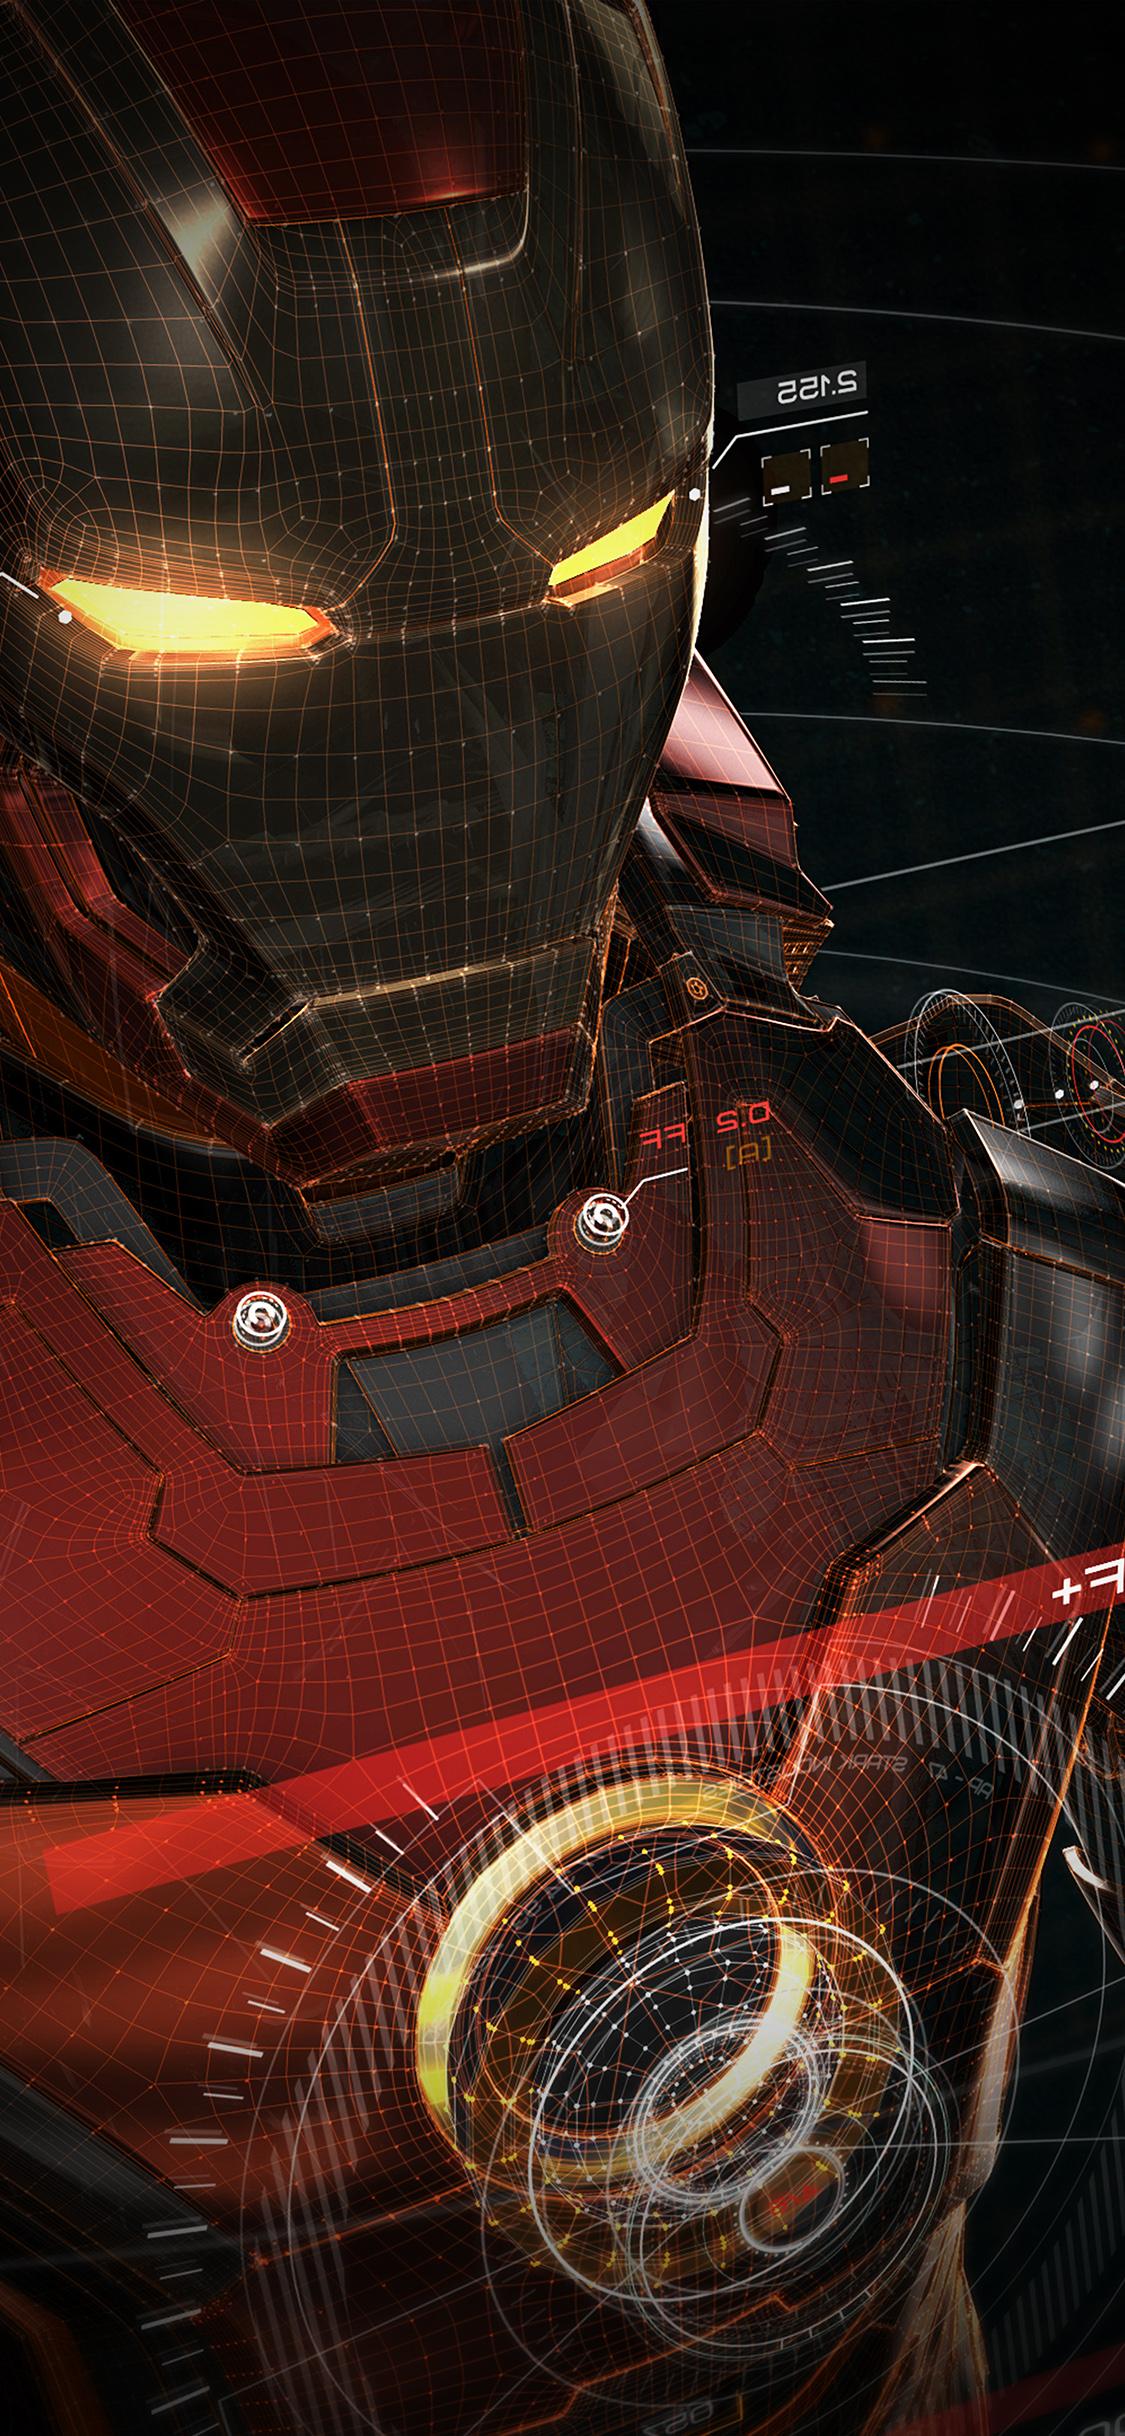 iPhoneXpapers.com-Apple-iPhone-wallpaper-aq06-ironman-3d-red-game-avengers-art-illustration-hero-vignette